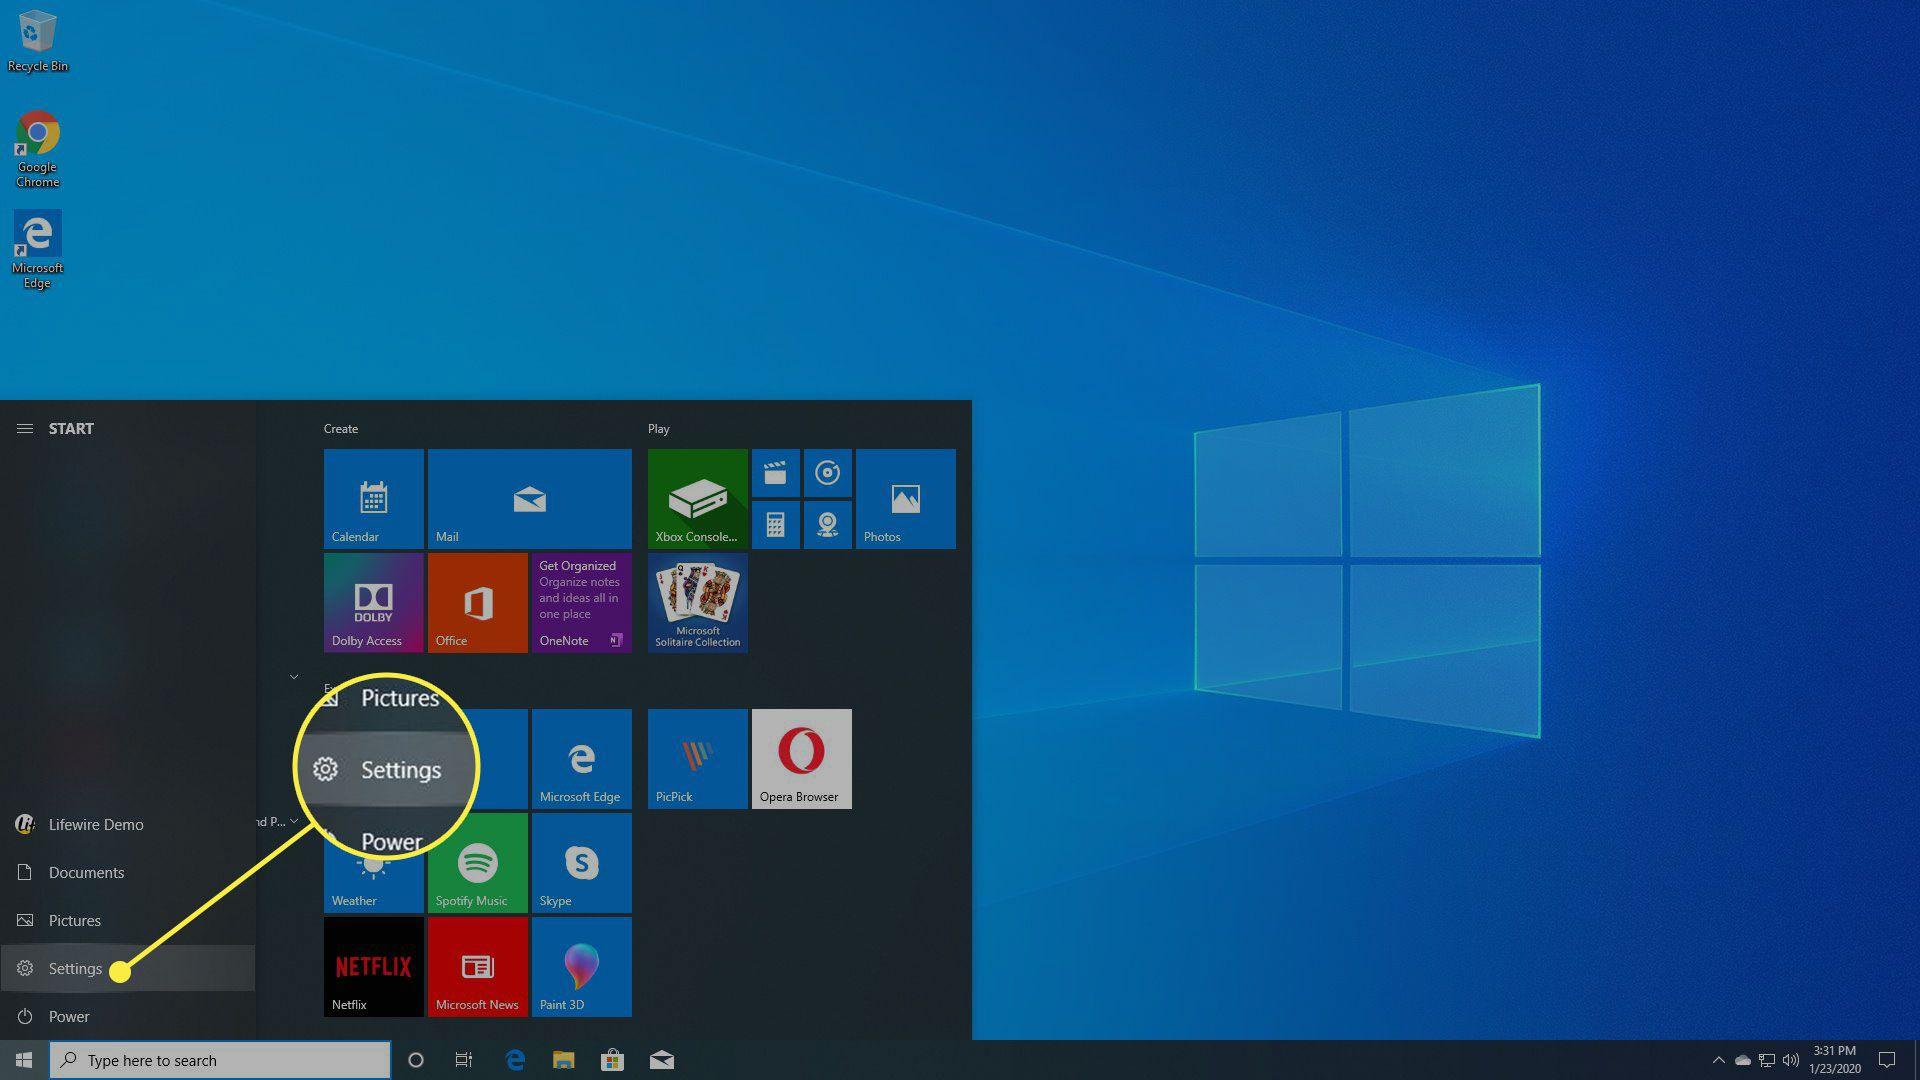 Settings under the Start menu in Windows 10